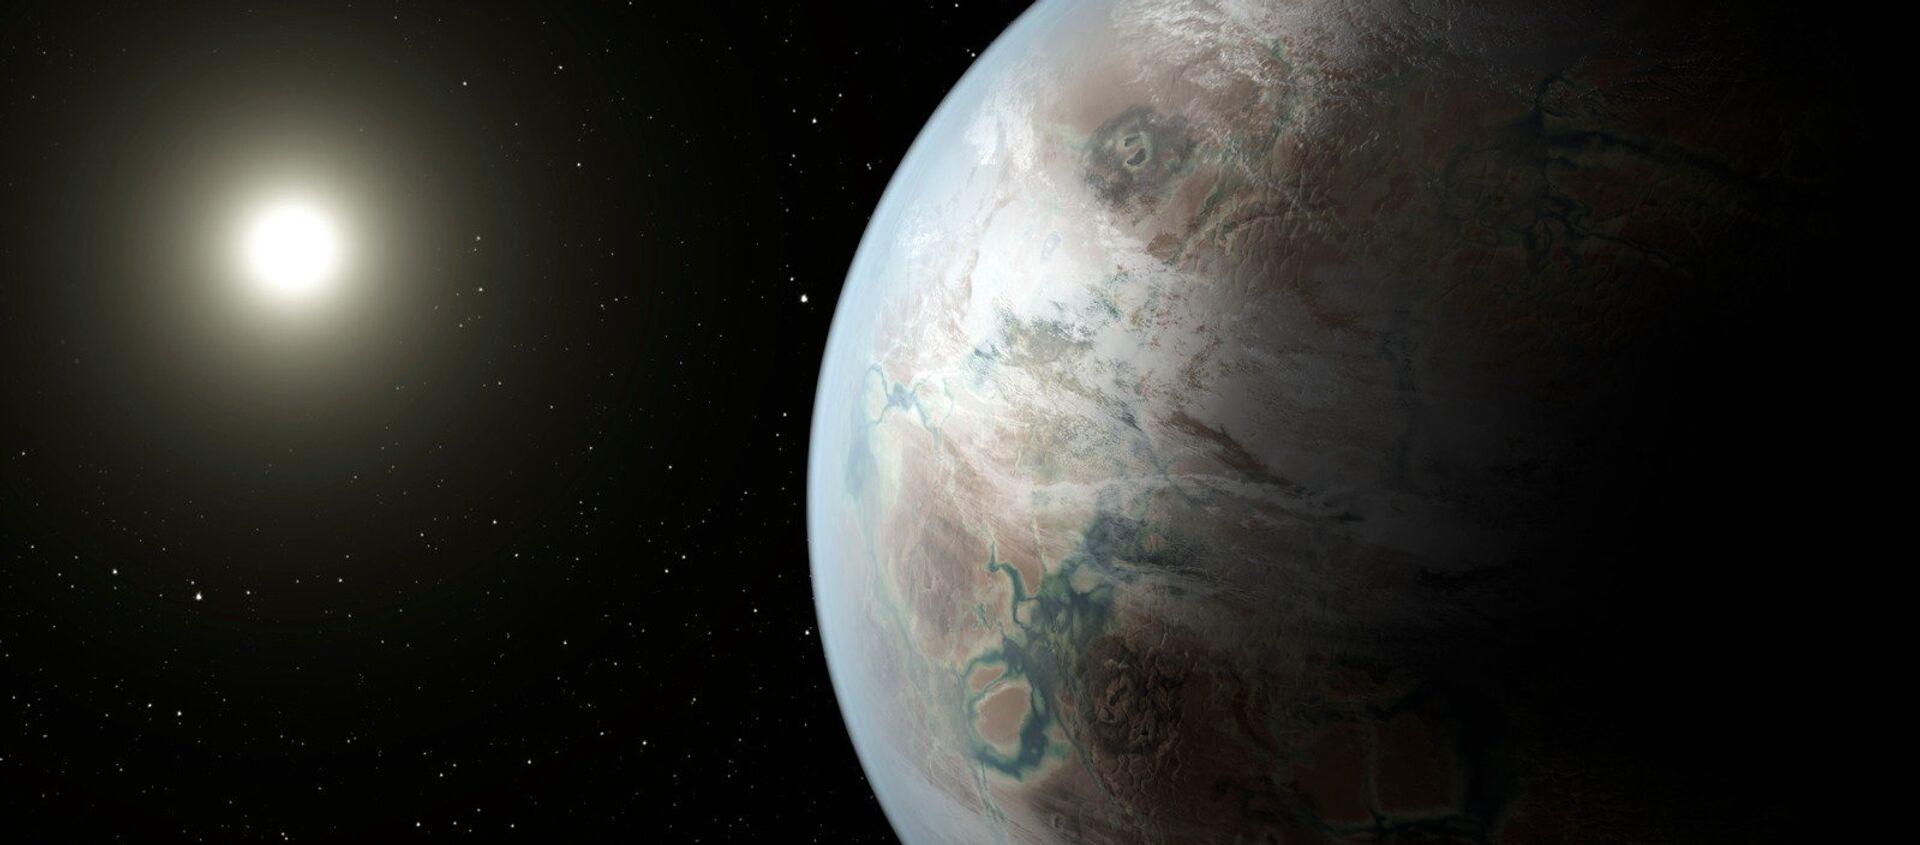 Un exoplaneta (imagen referencial) - Sputnik Mundo, 1920, 17.12.2020